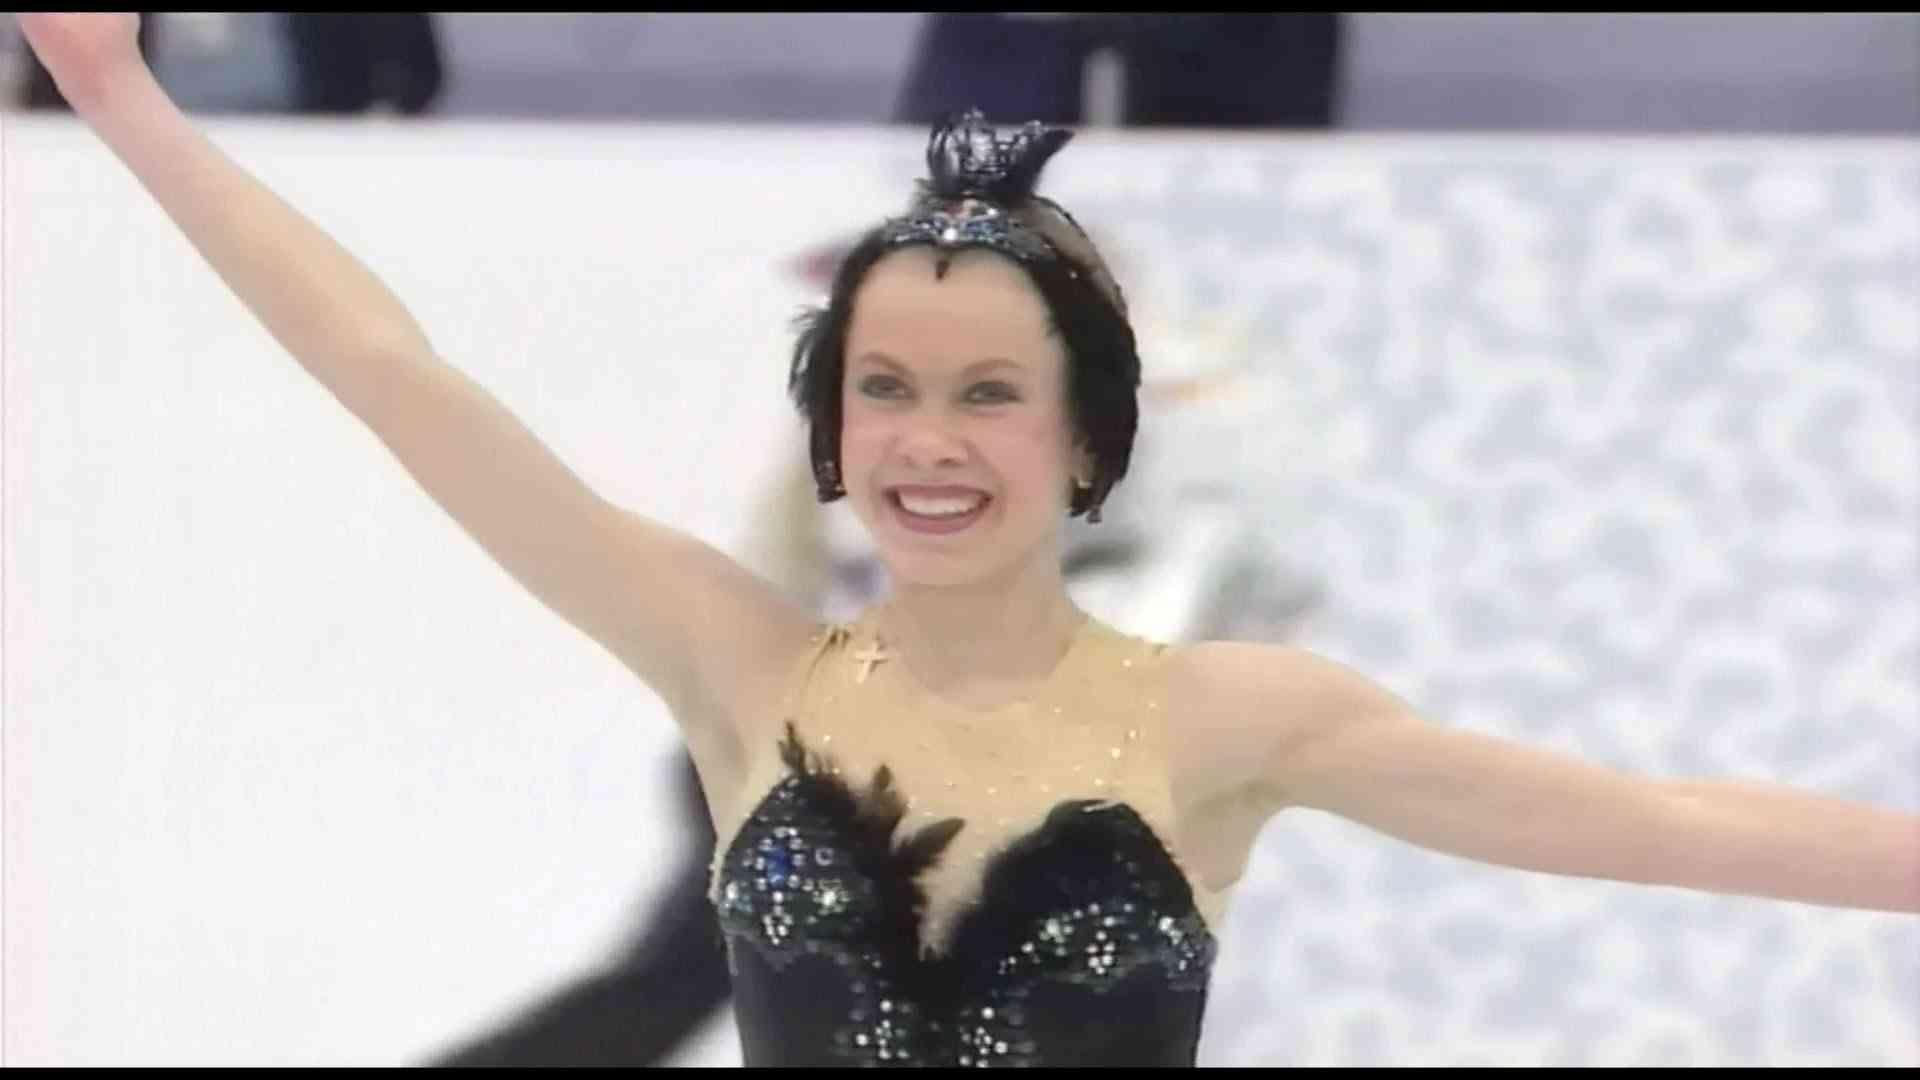 [HD] Oksana Baiul - 1994 Lillehammer Olympic - Technical Program - The Swan Lake - YouTube